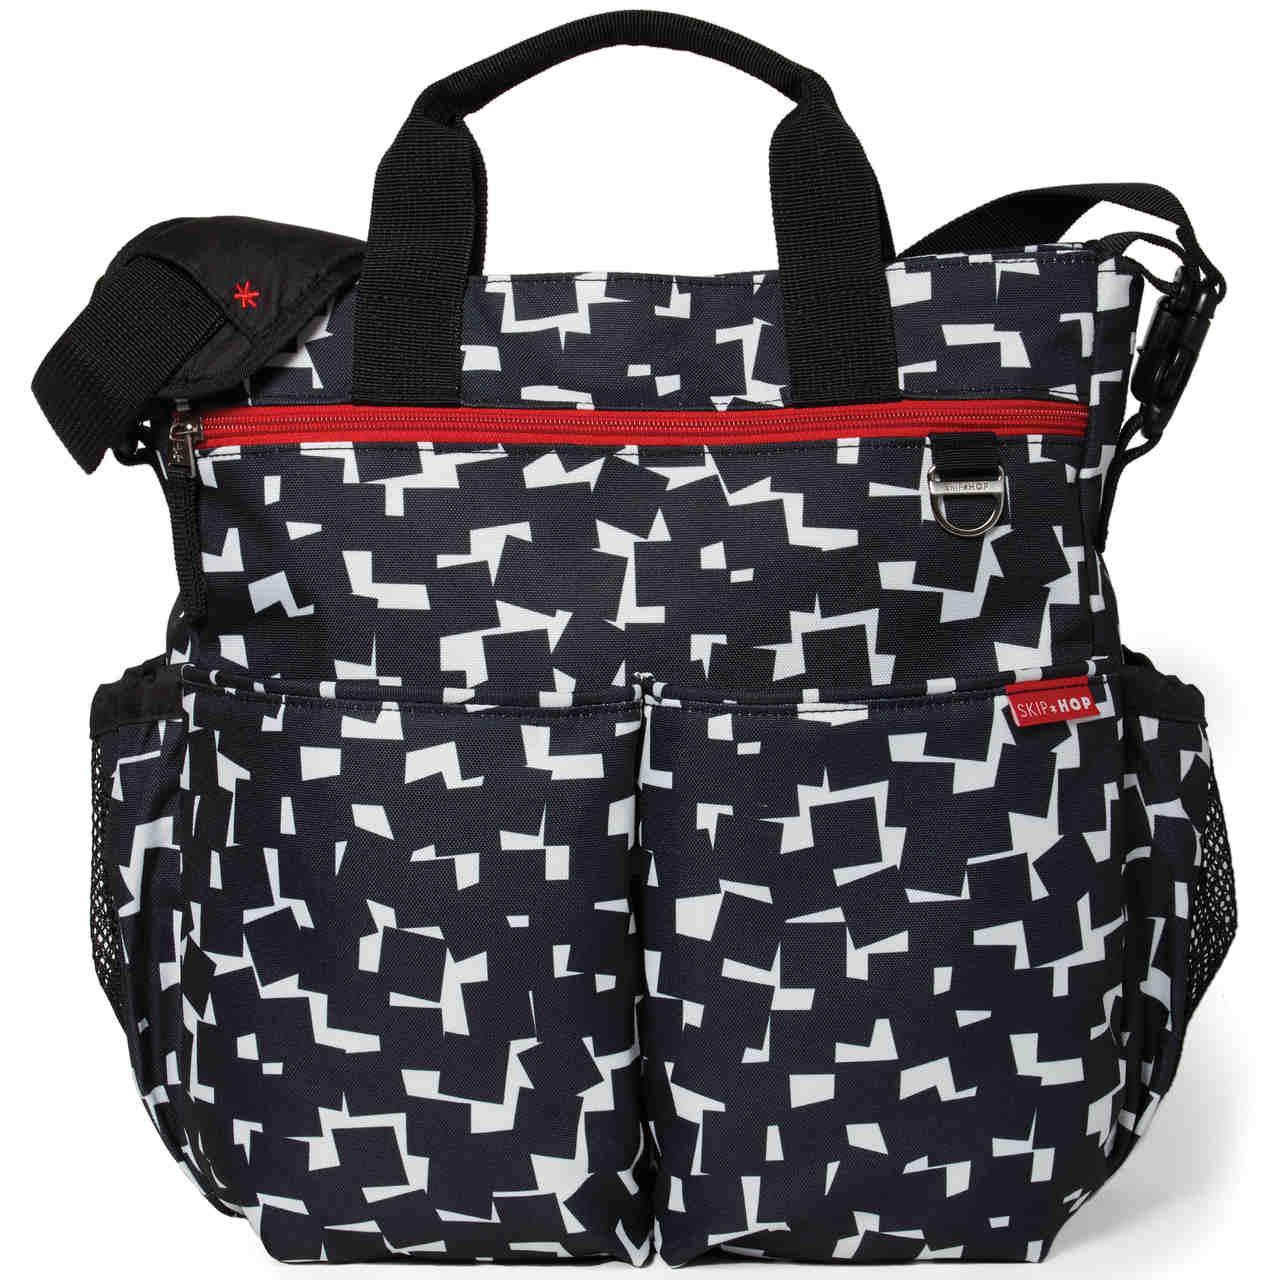 Bolsa Maternidade Skip Hop (Diaper Bag) Duo Signature - Cubes